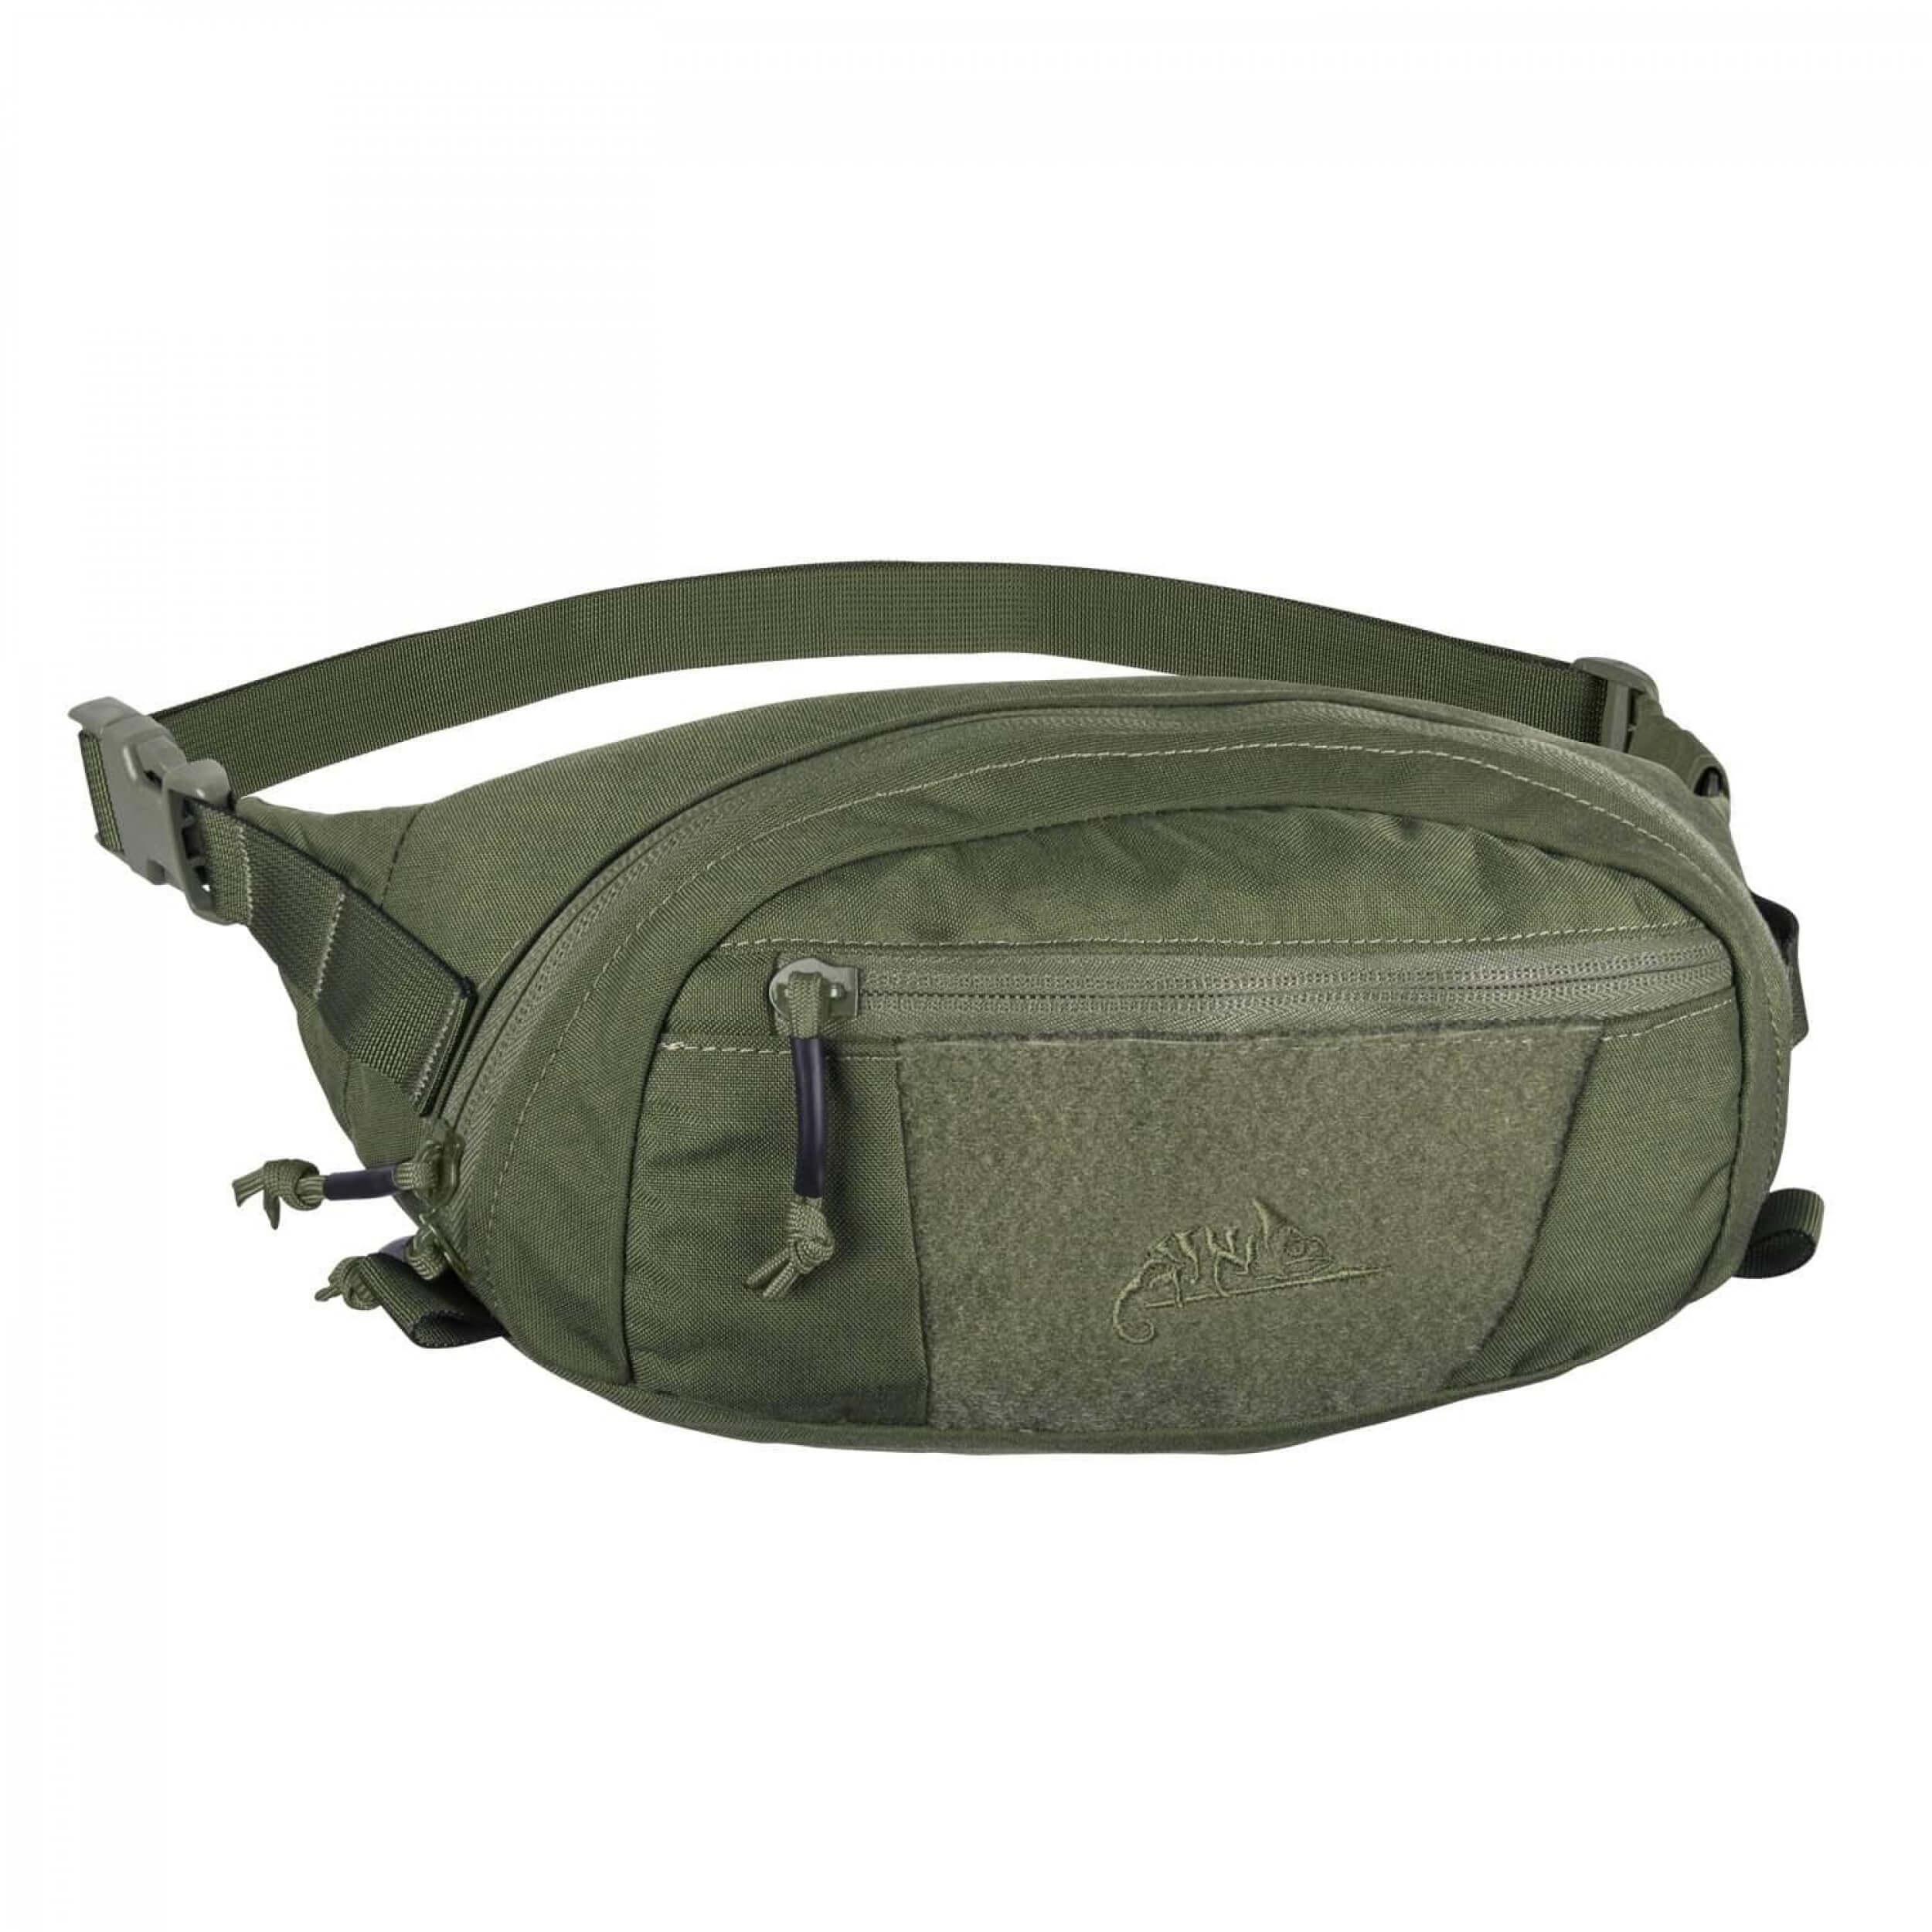 Helikon-Tex Waist Pack Bandicoot Gürteltasche Hüfttasche Olive Green